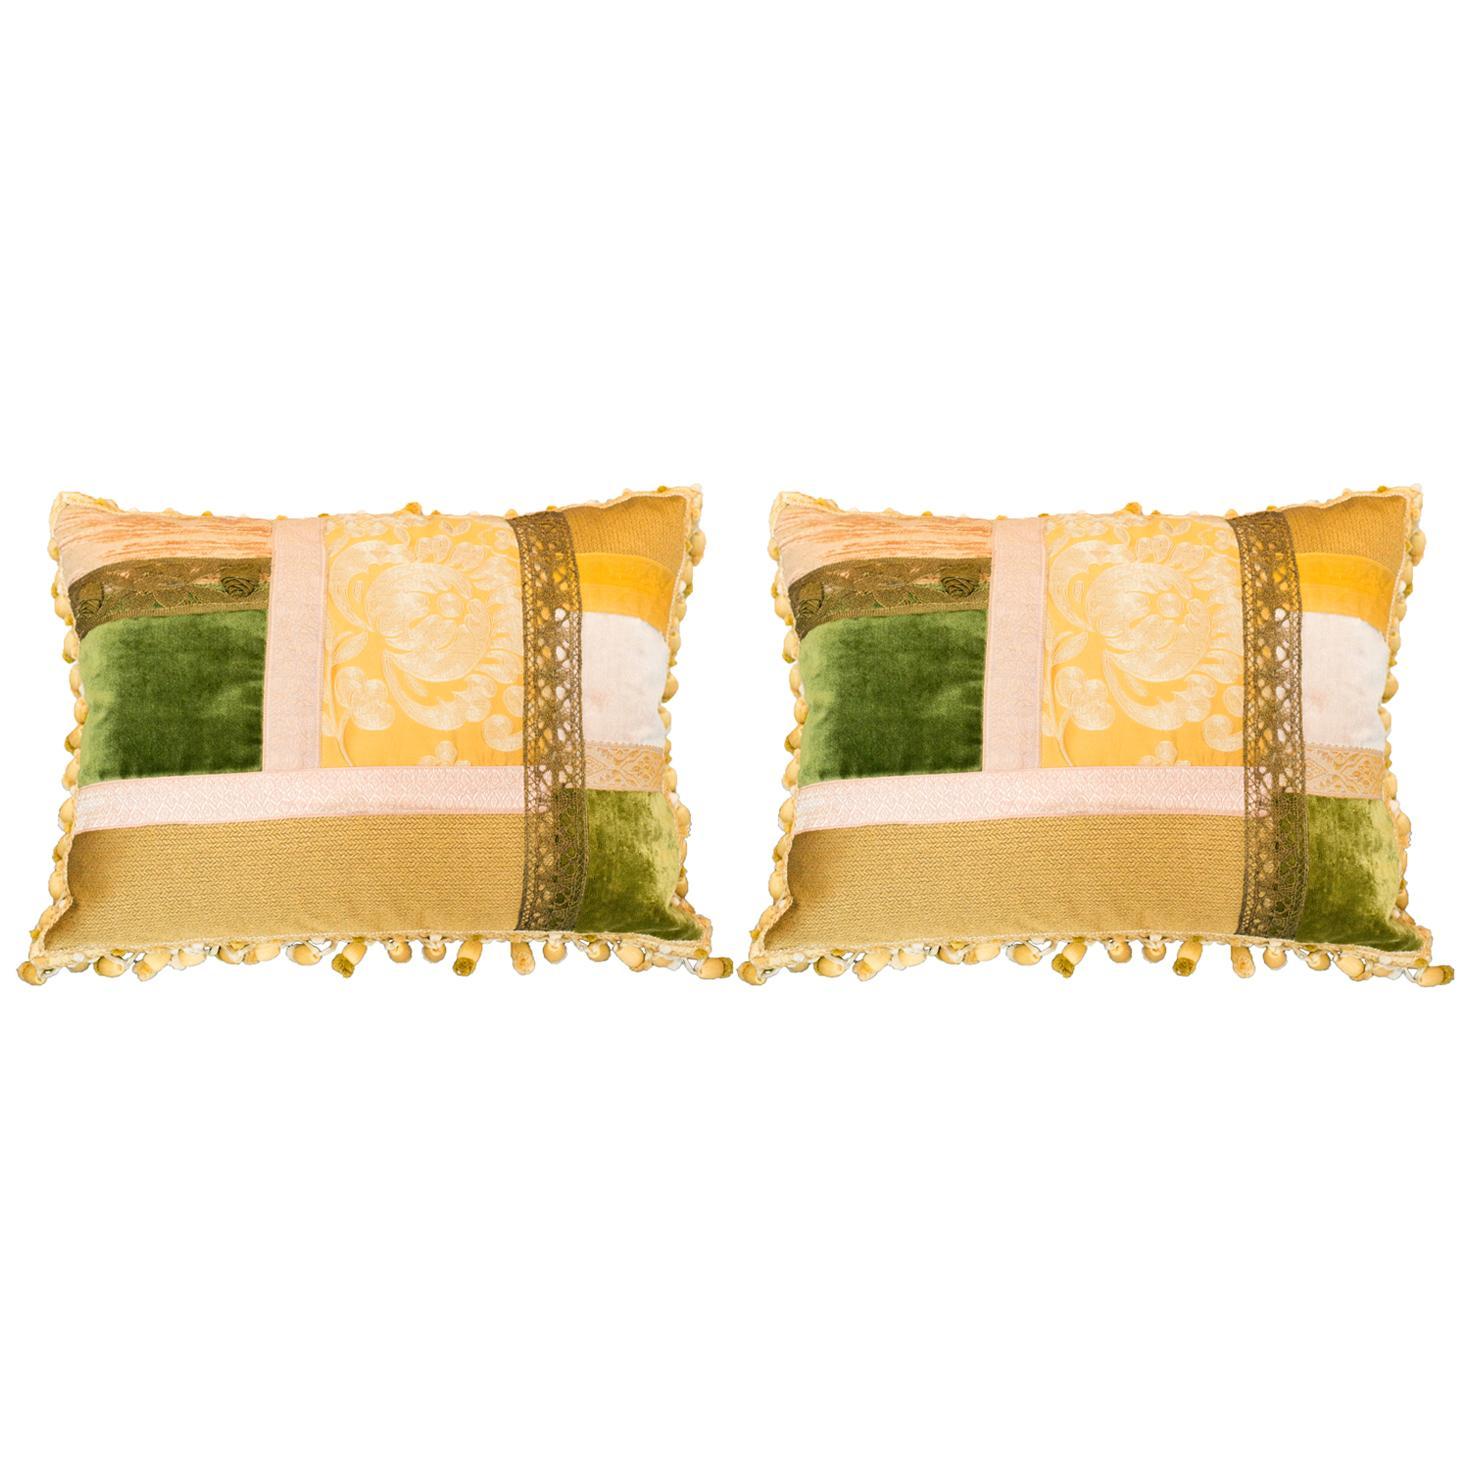 Pair of Studio Maison Nurita Patchwork Silk and Cut Pile Velvet Pillows